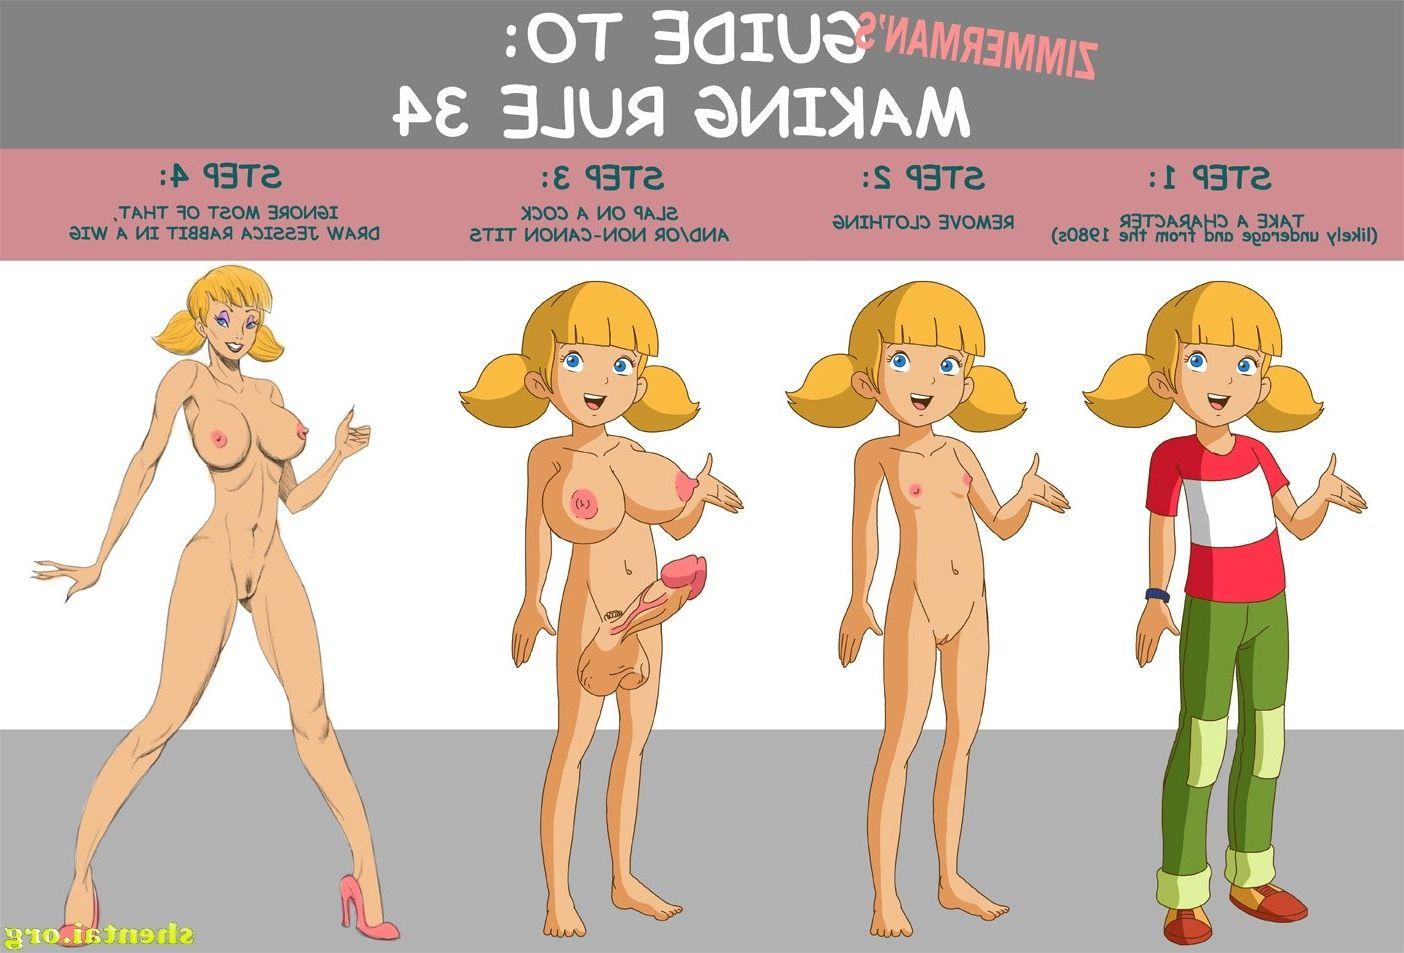 inspector-gadget-artwork-mega-pack image_2705.jpg